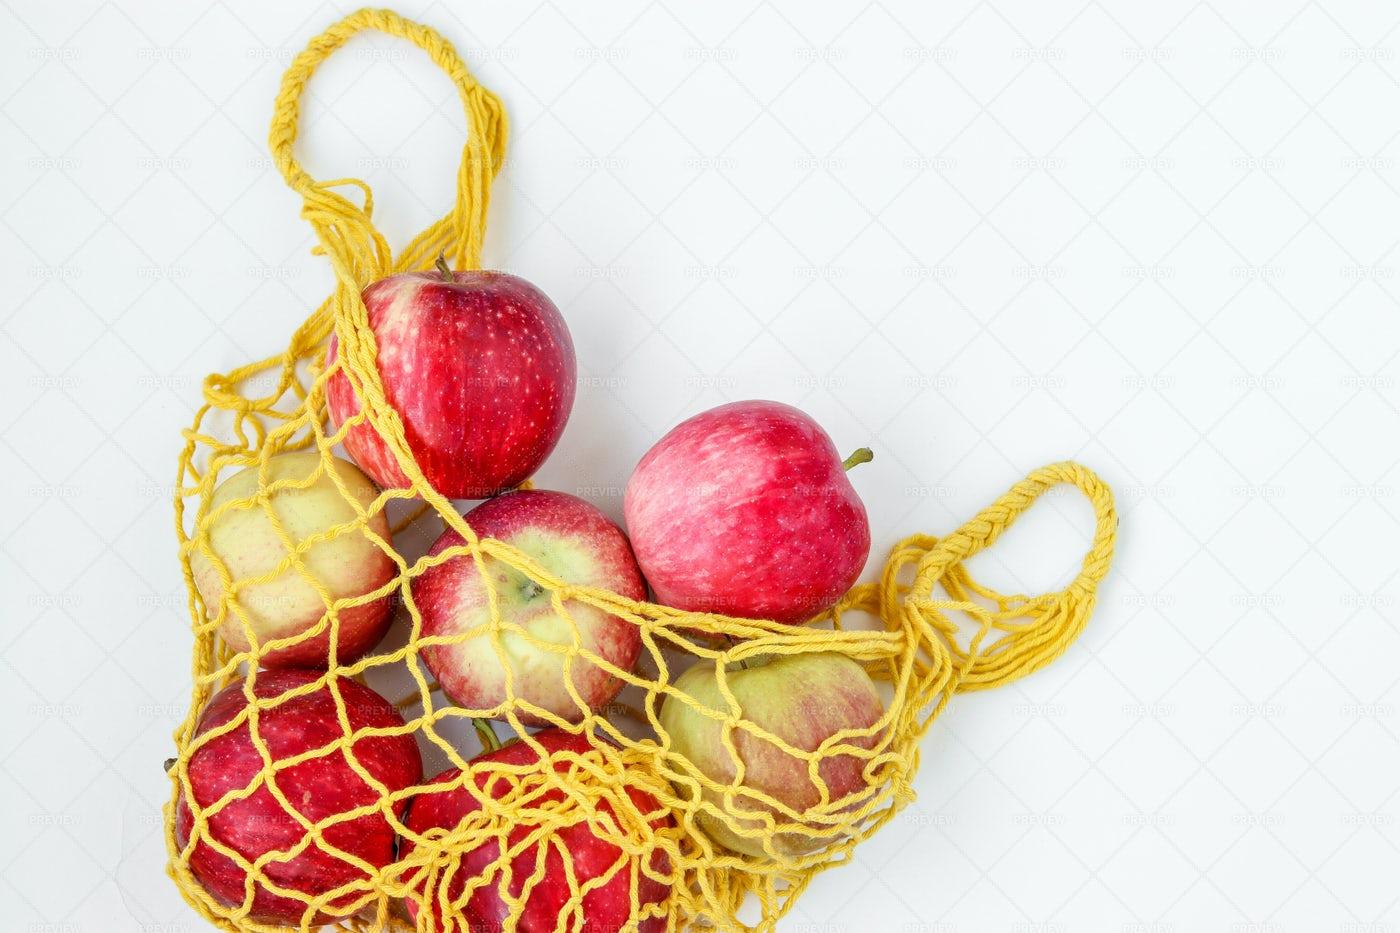 A Sack Of Apples: Stock Photos